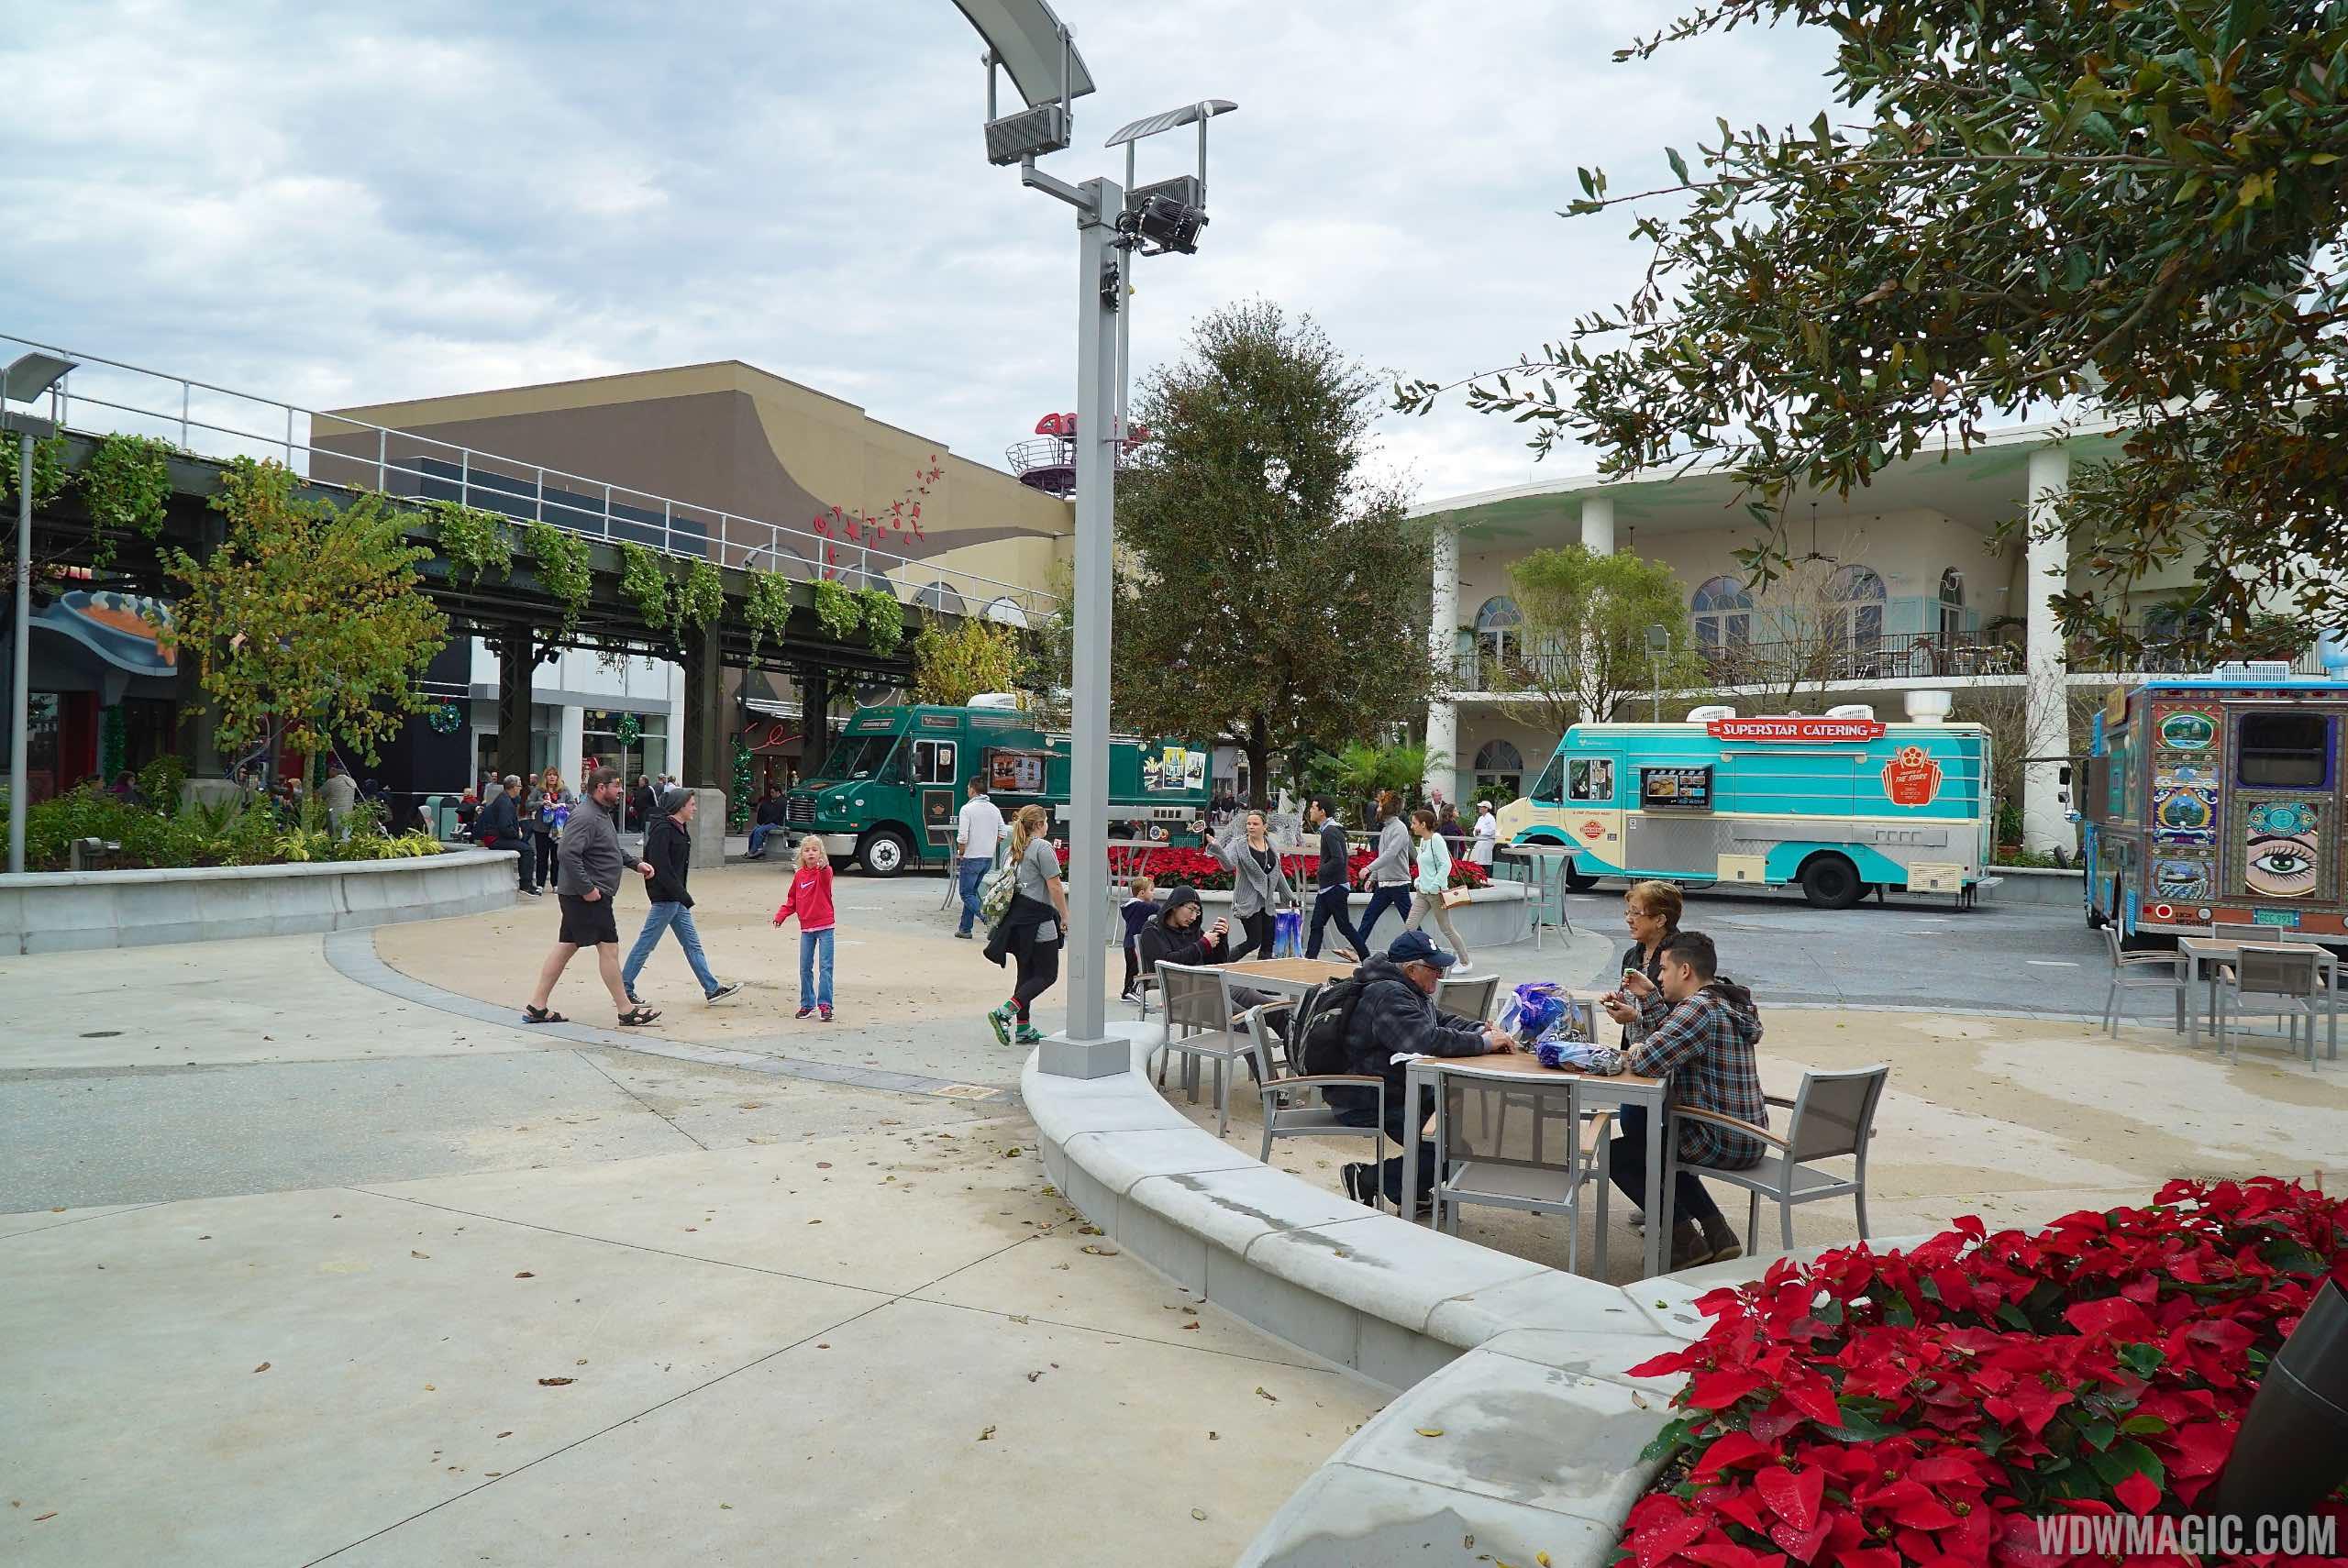 Food Truck park at Disney Springs